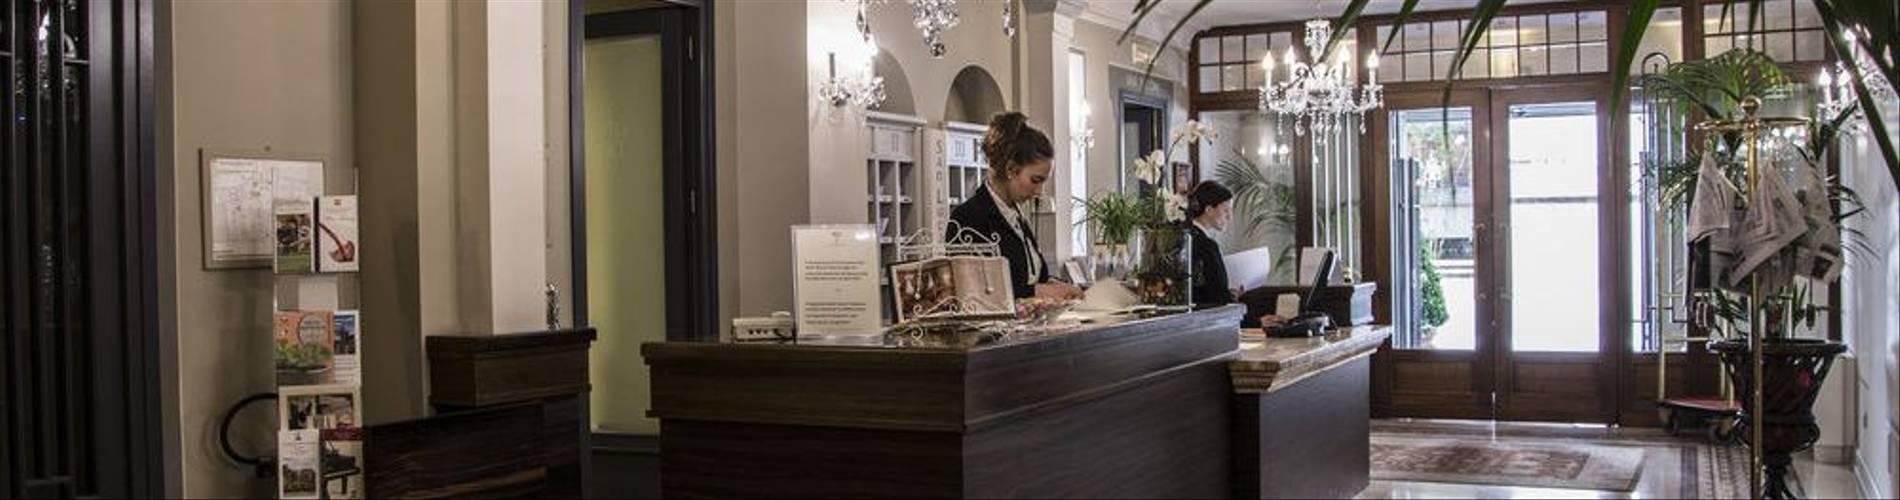 03-Hotel San Luca Palace.jpg